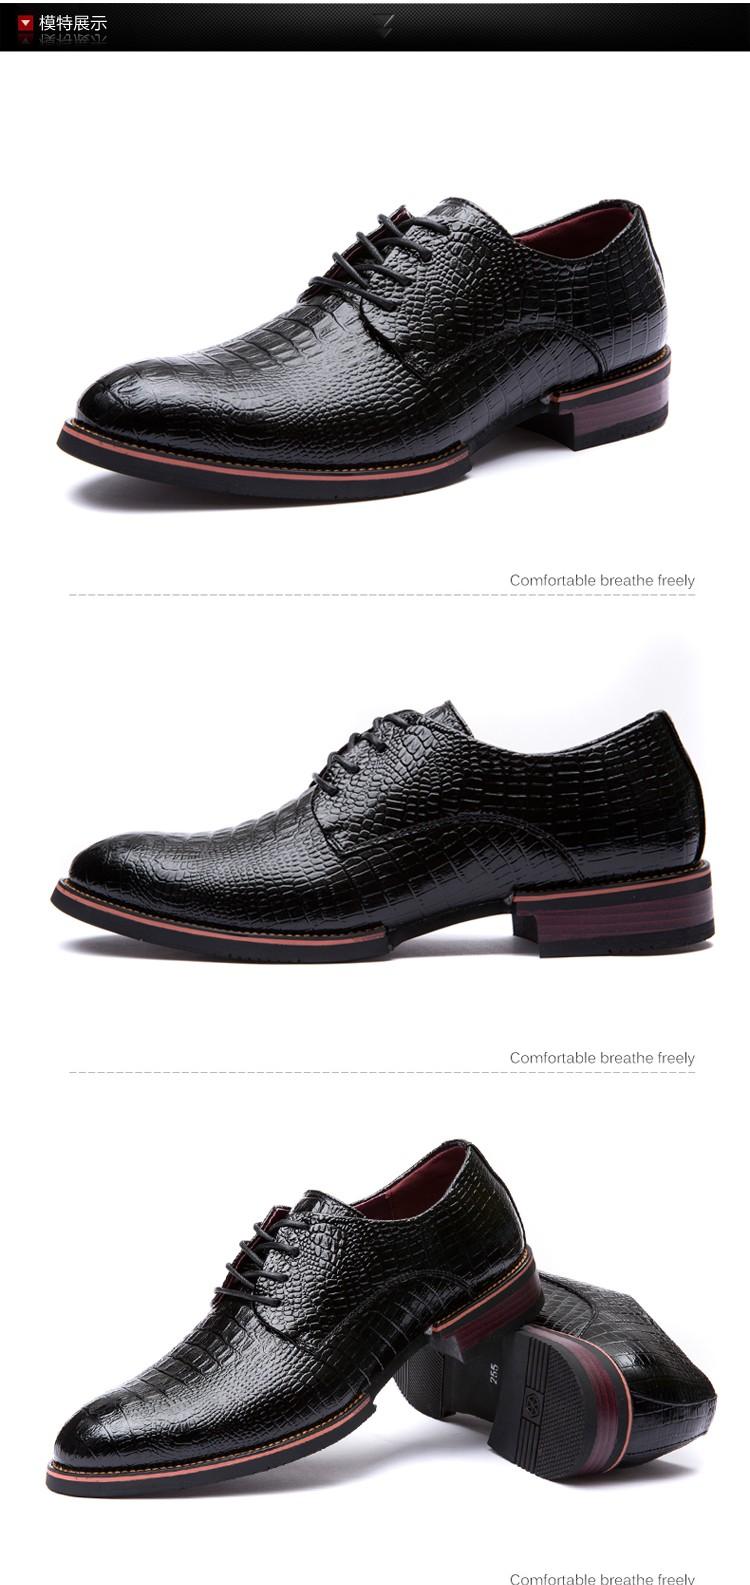 LELE New Fashion Men's Flats Dress Shoes Crocodile Grain High quality Genuine Leather Lace Up Oxford Business Derby Shoe golden